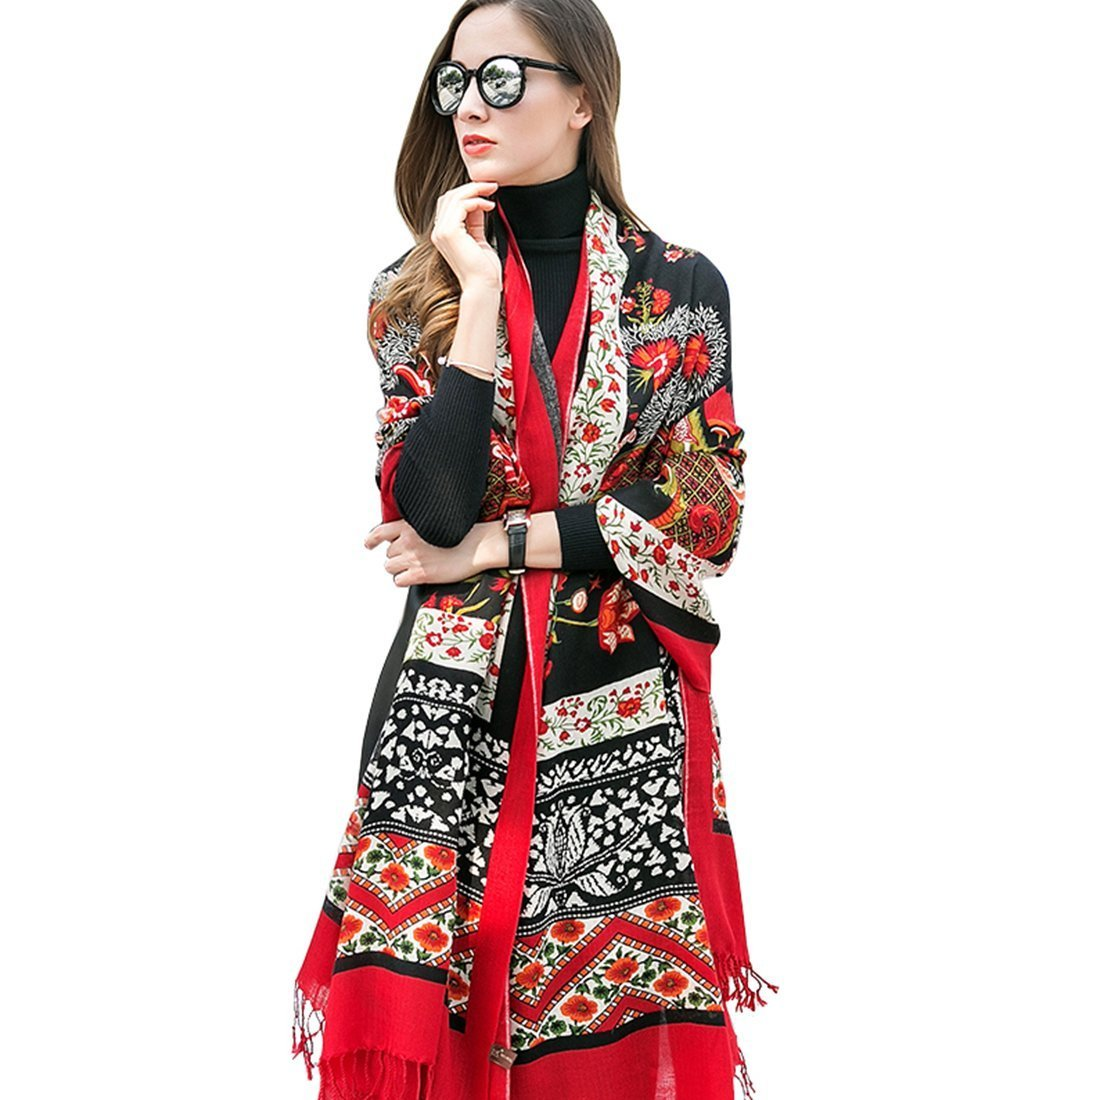 DANA XU 100% Pure Wool Women Scarf Large Size Pashmina (Red)